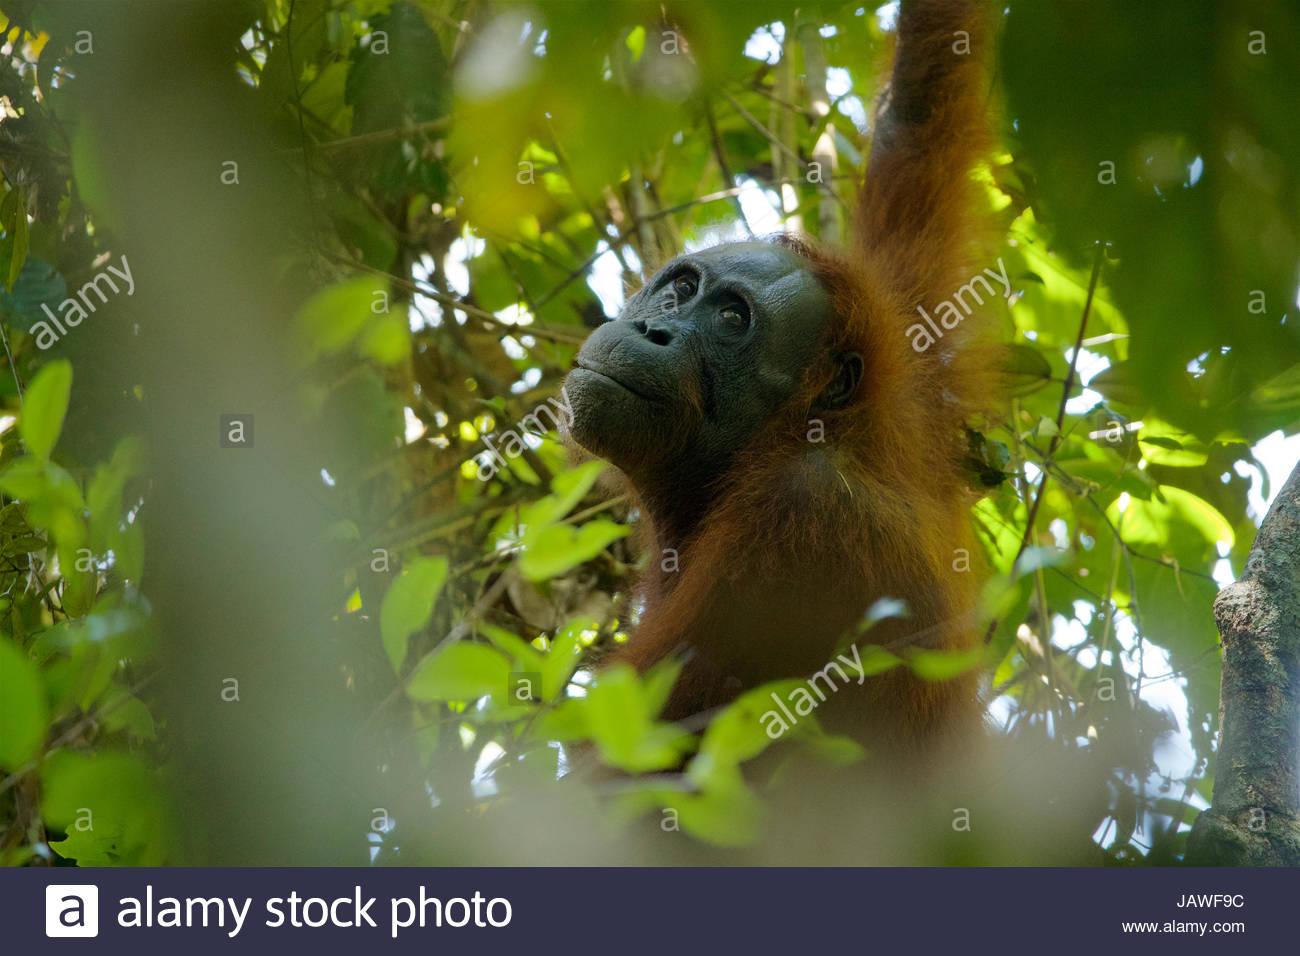 Une femelle adulte orang-outan, Pongo pygmaeus, wurmbii repose dans un arbre à Gunung Palung National Park. Photo Stock